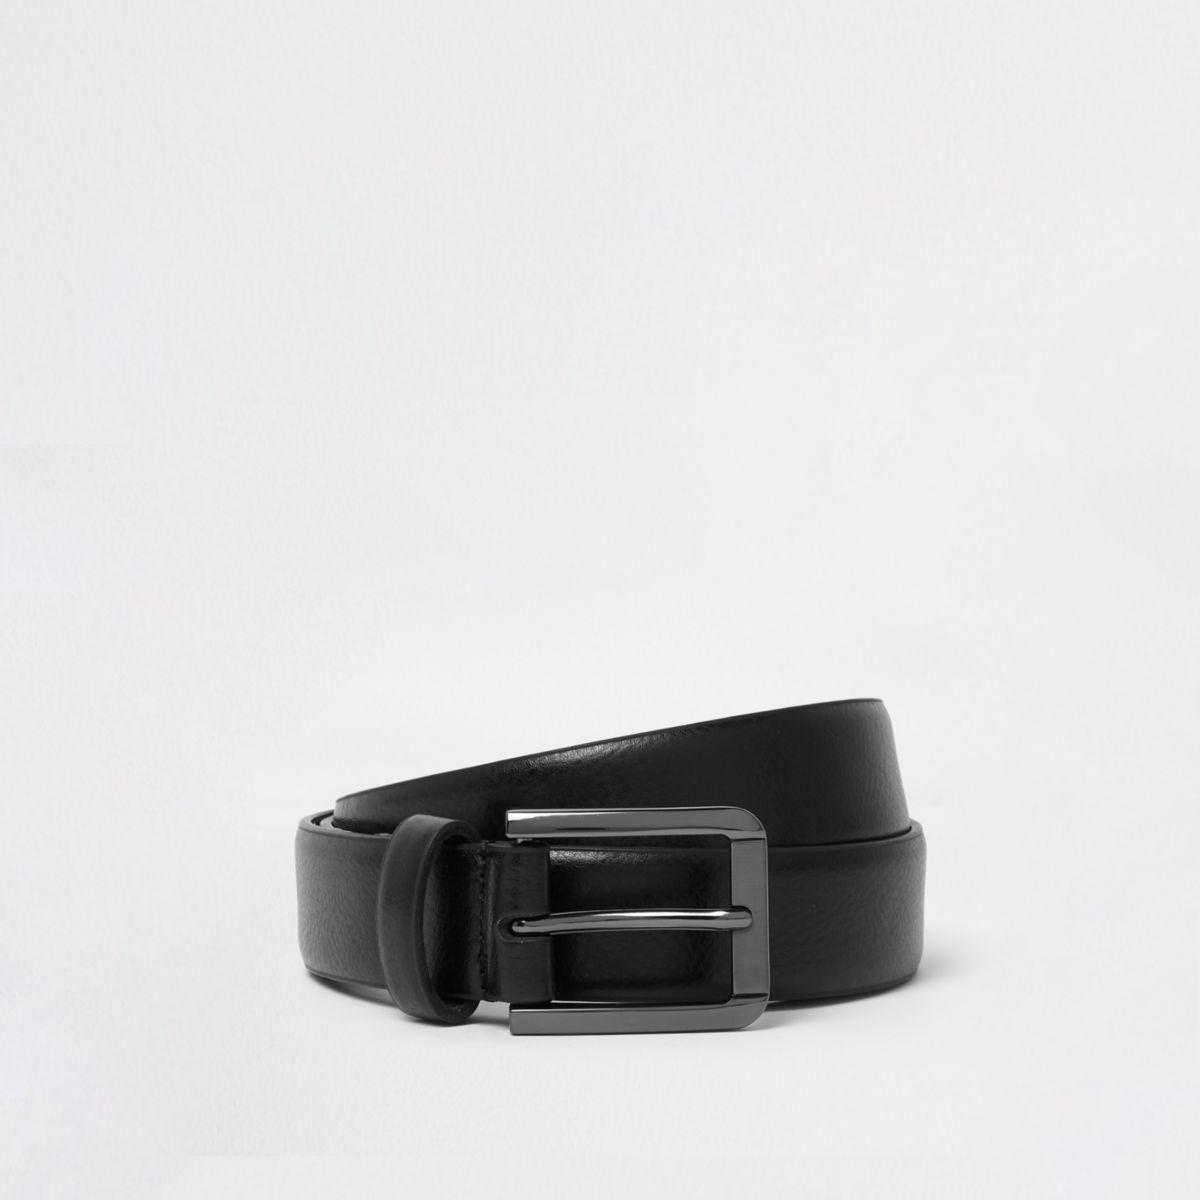 Ceinture noire habillée